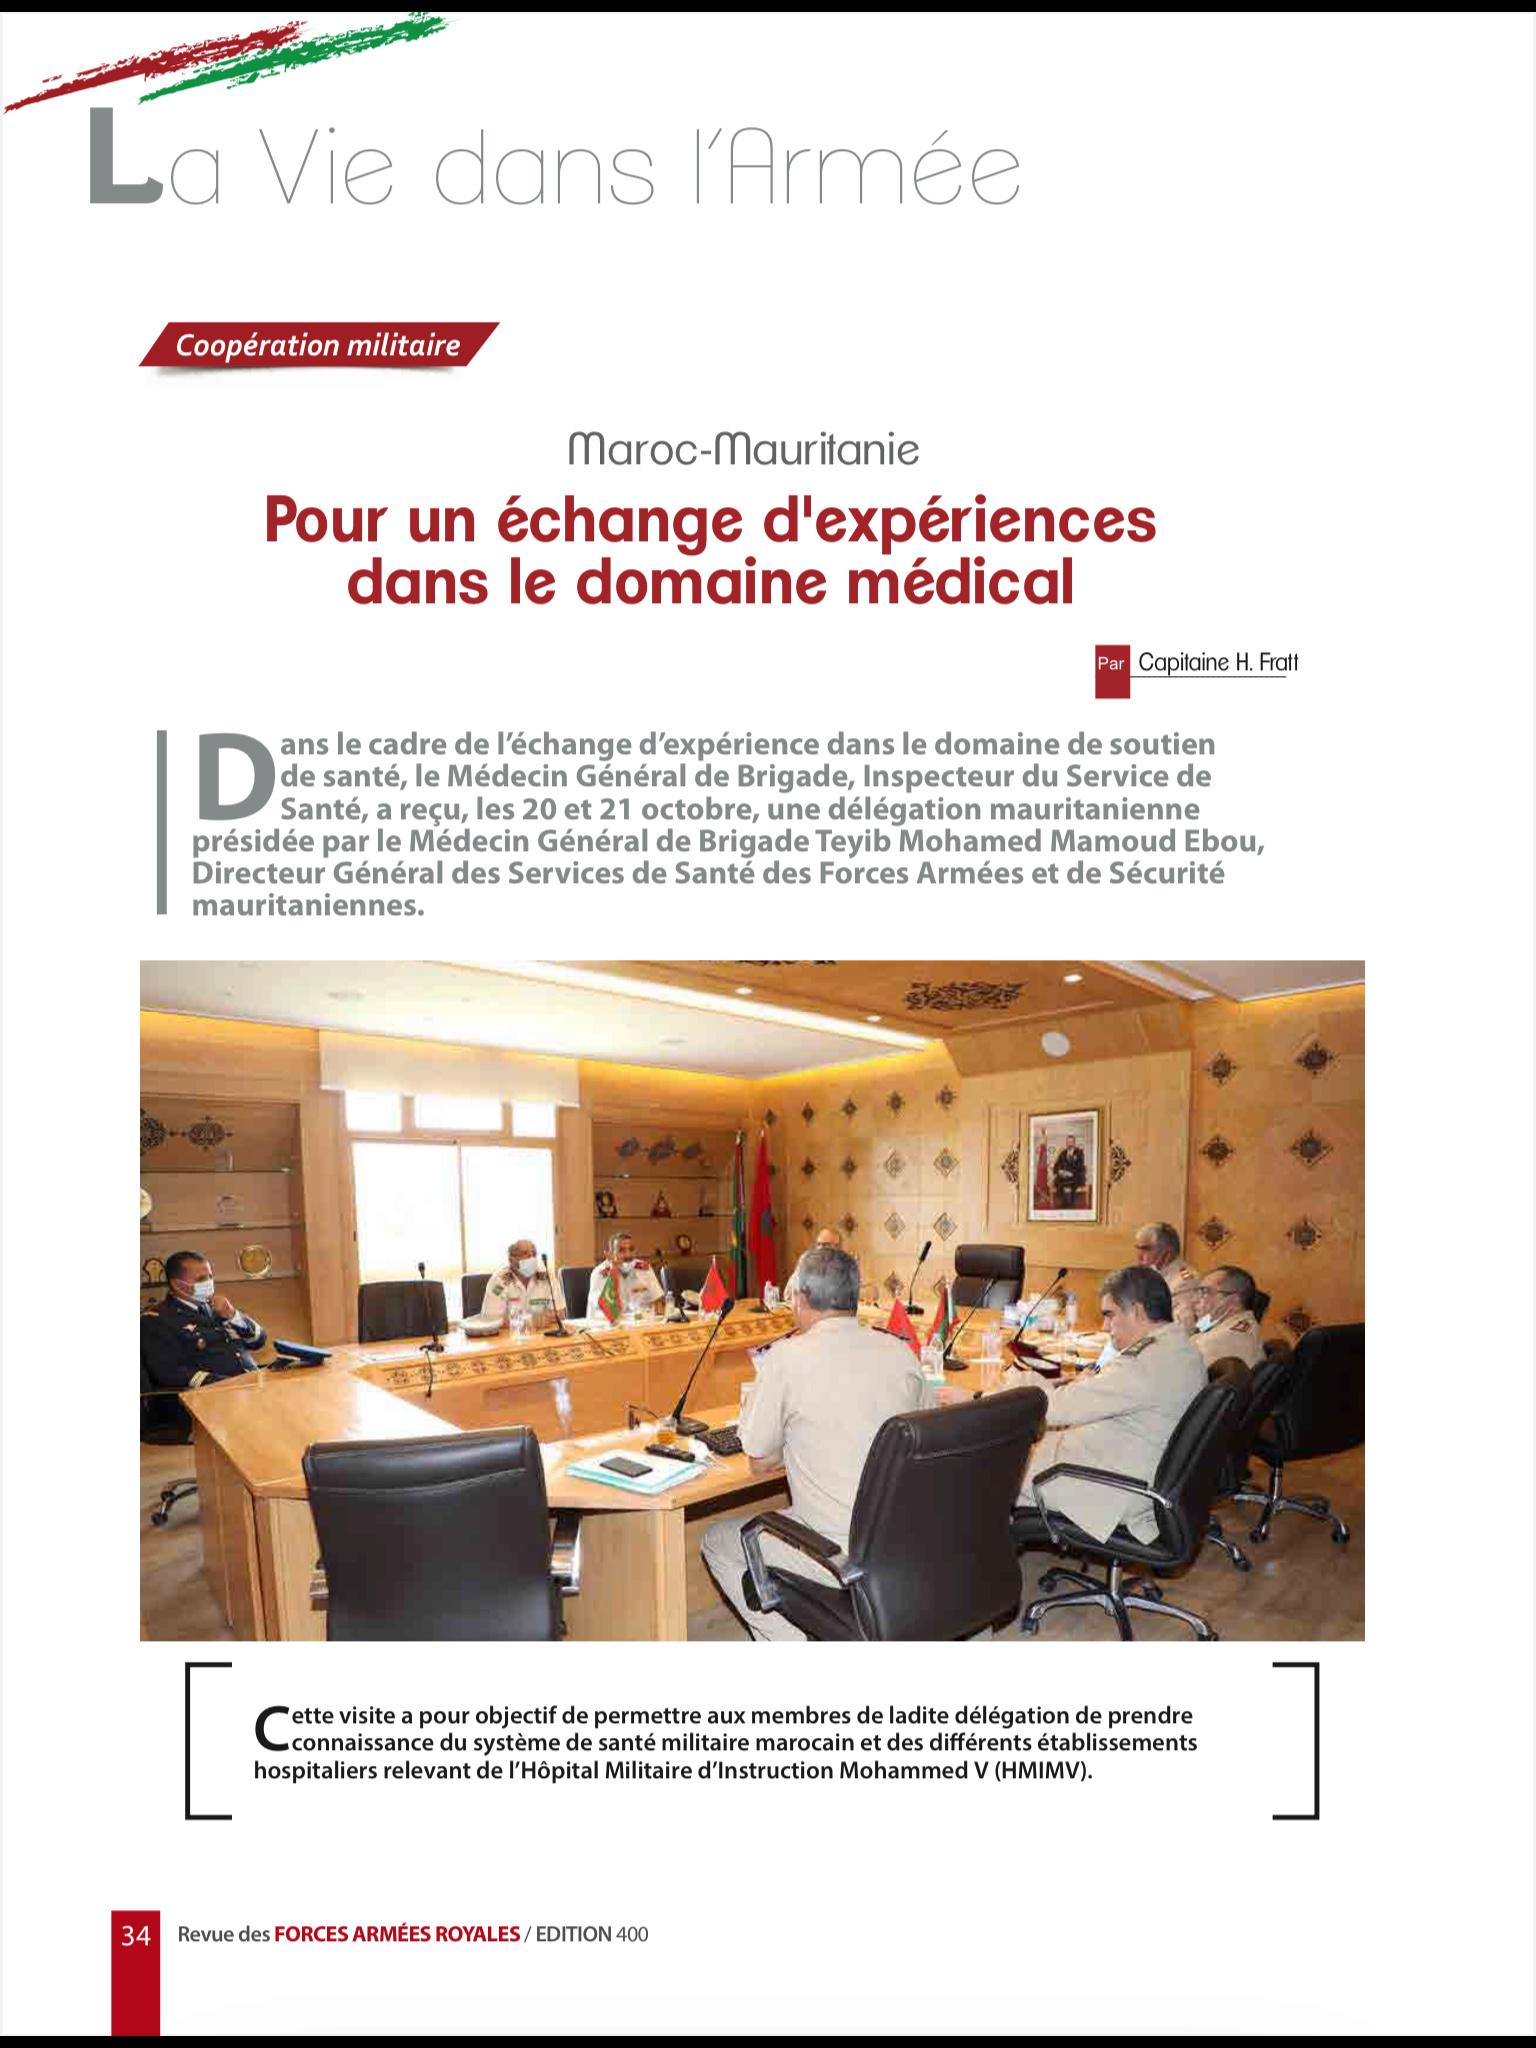 Coopération Militaire Maroc-Mauritanie 9fe51610